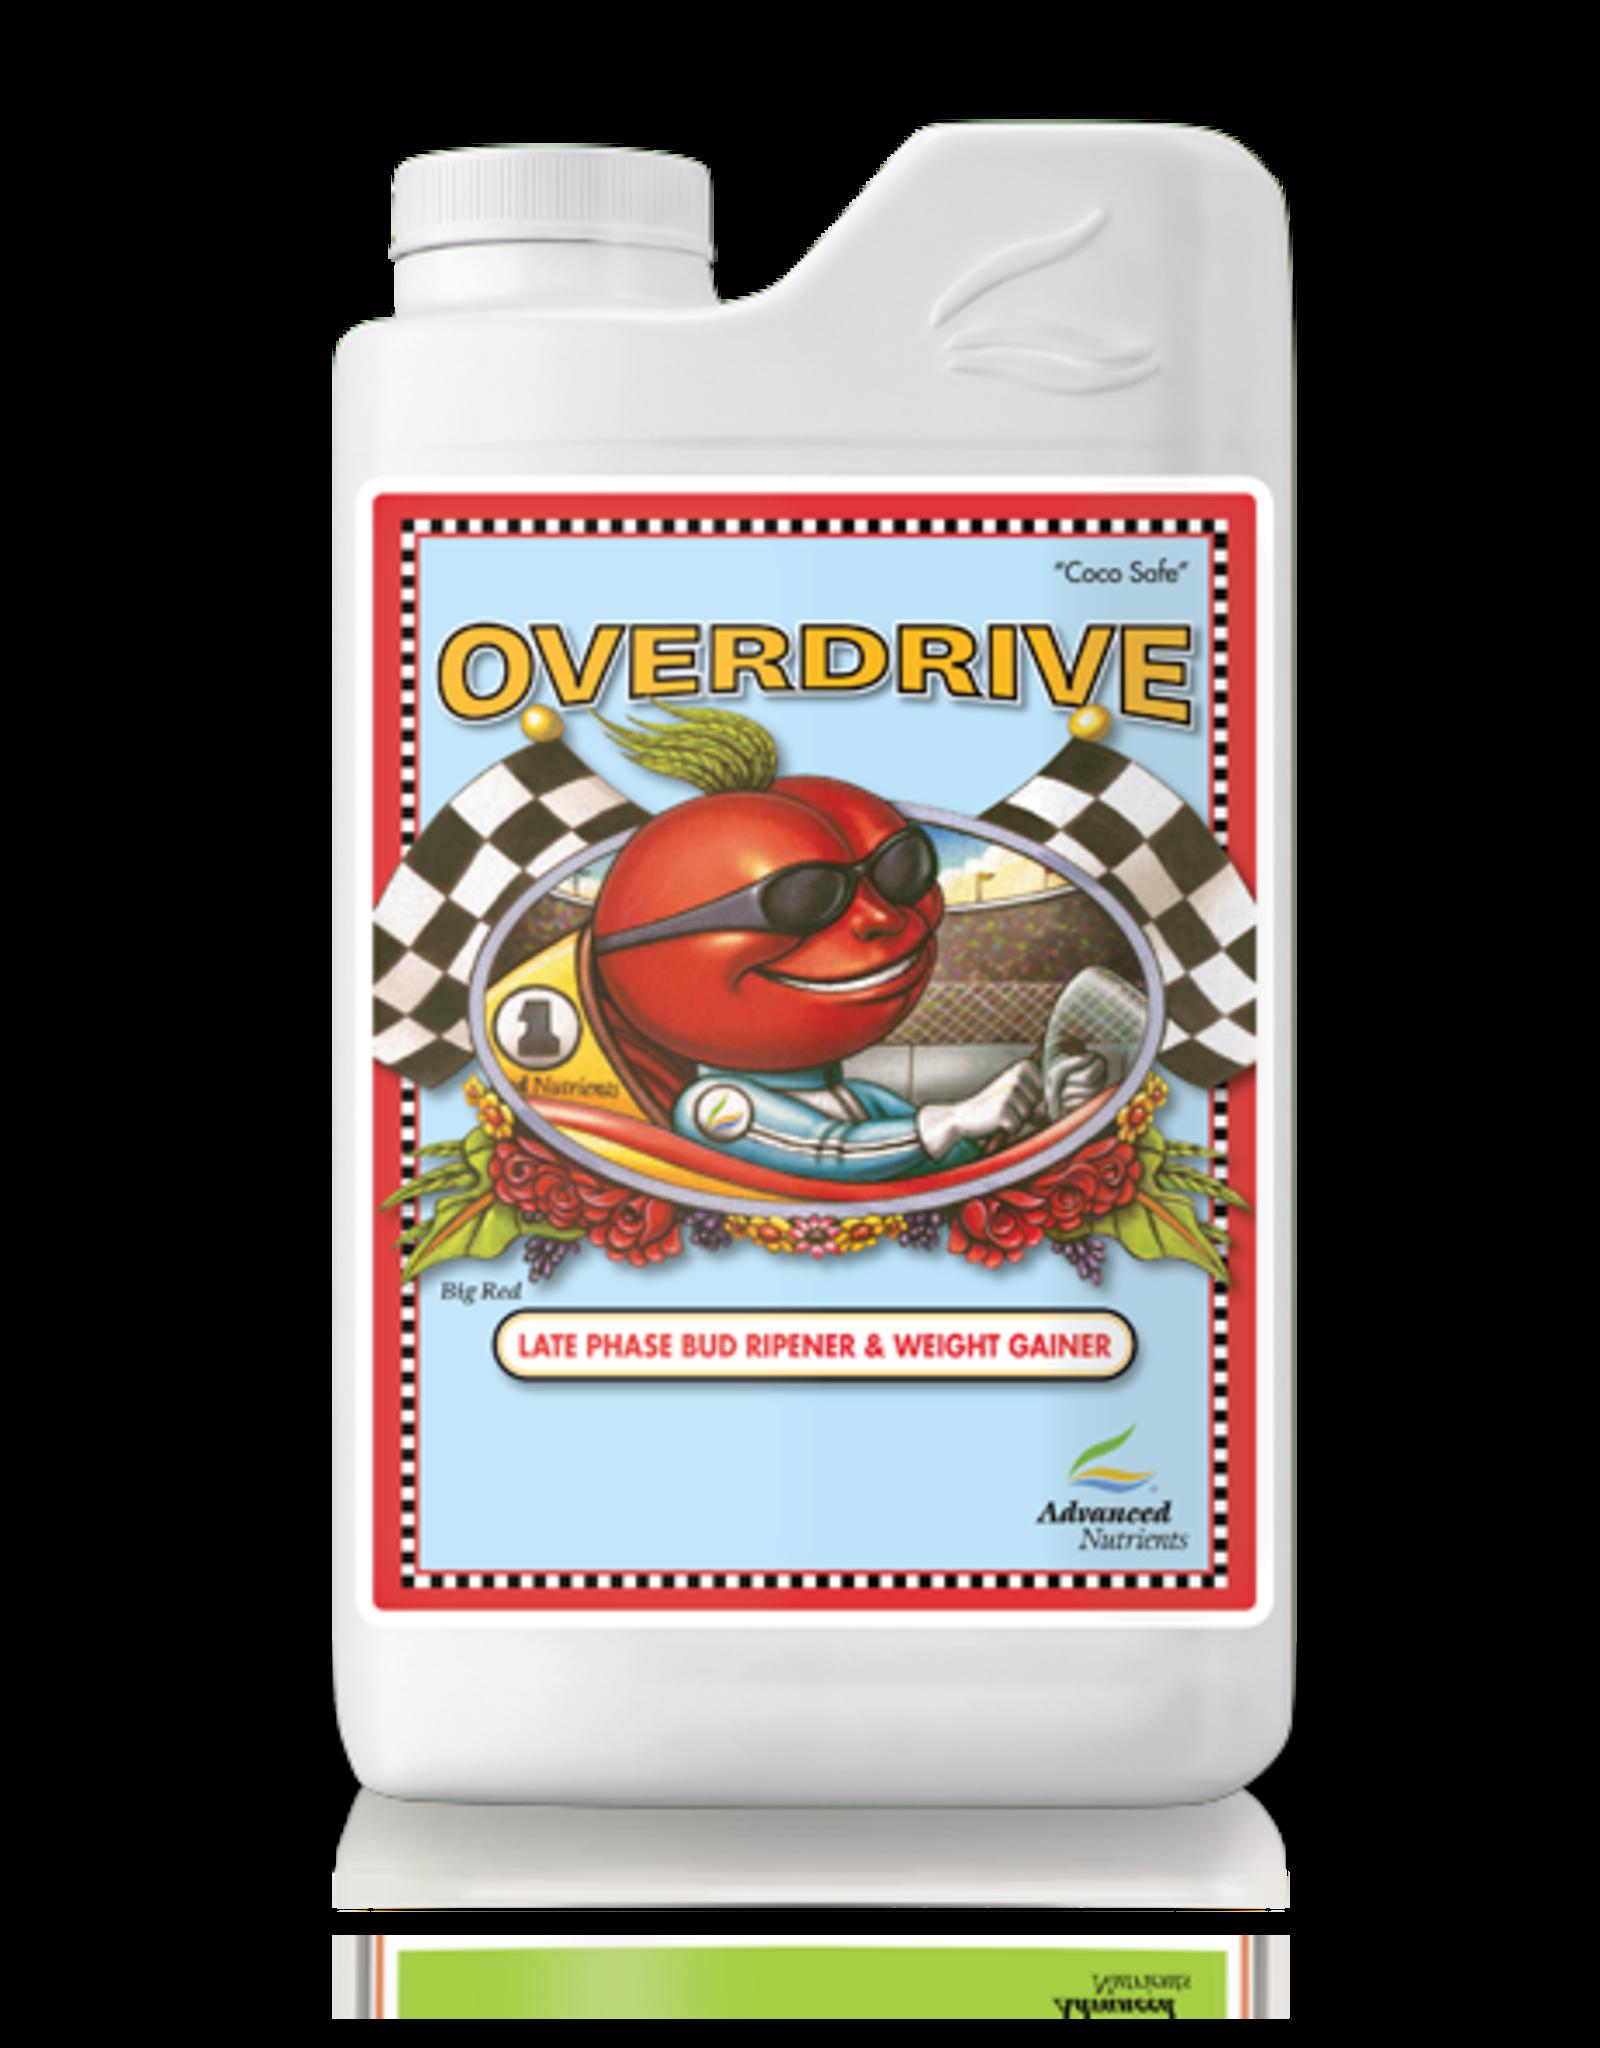 Advanced Nutrients Advanced Overdrive 1L